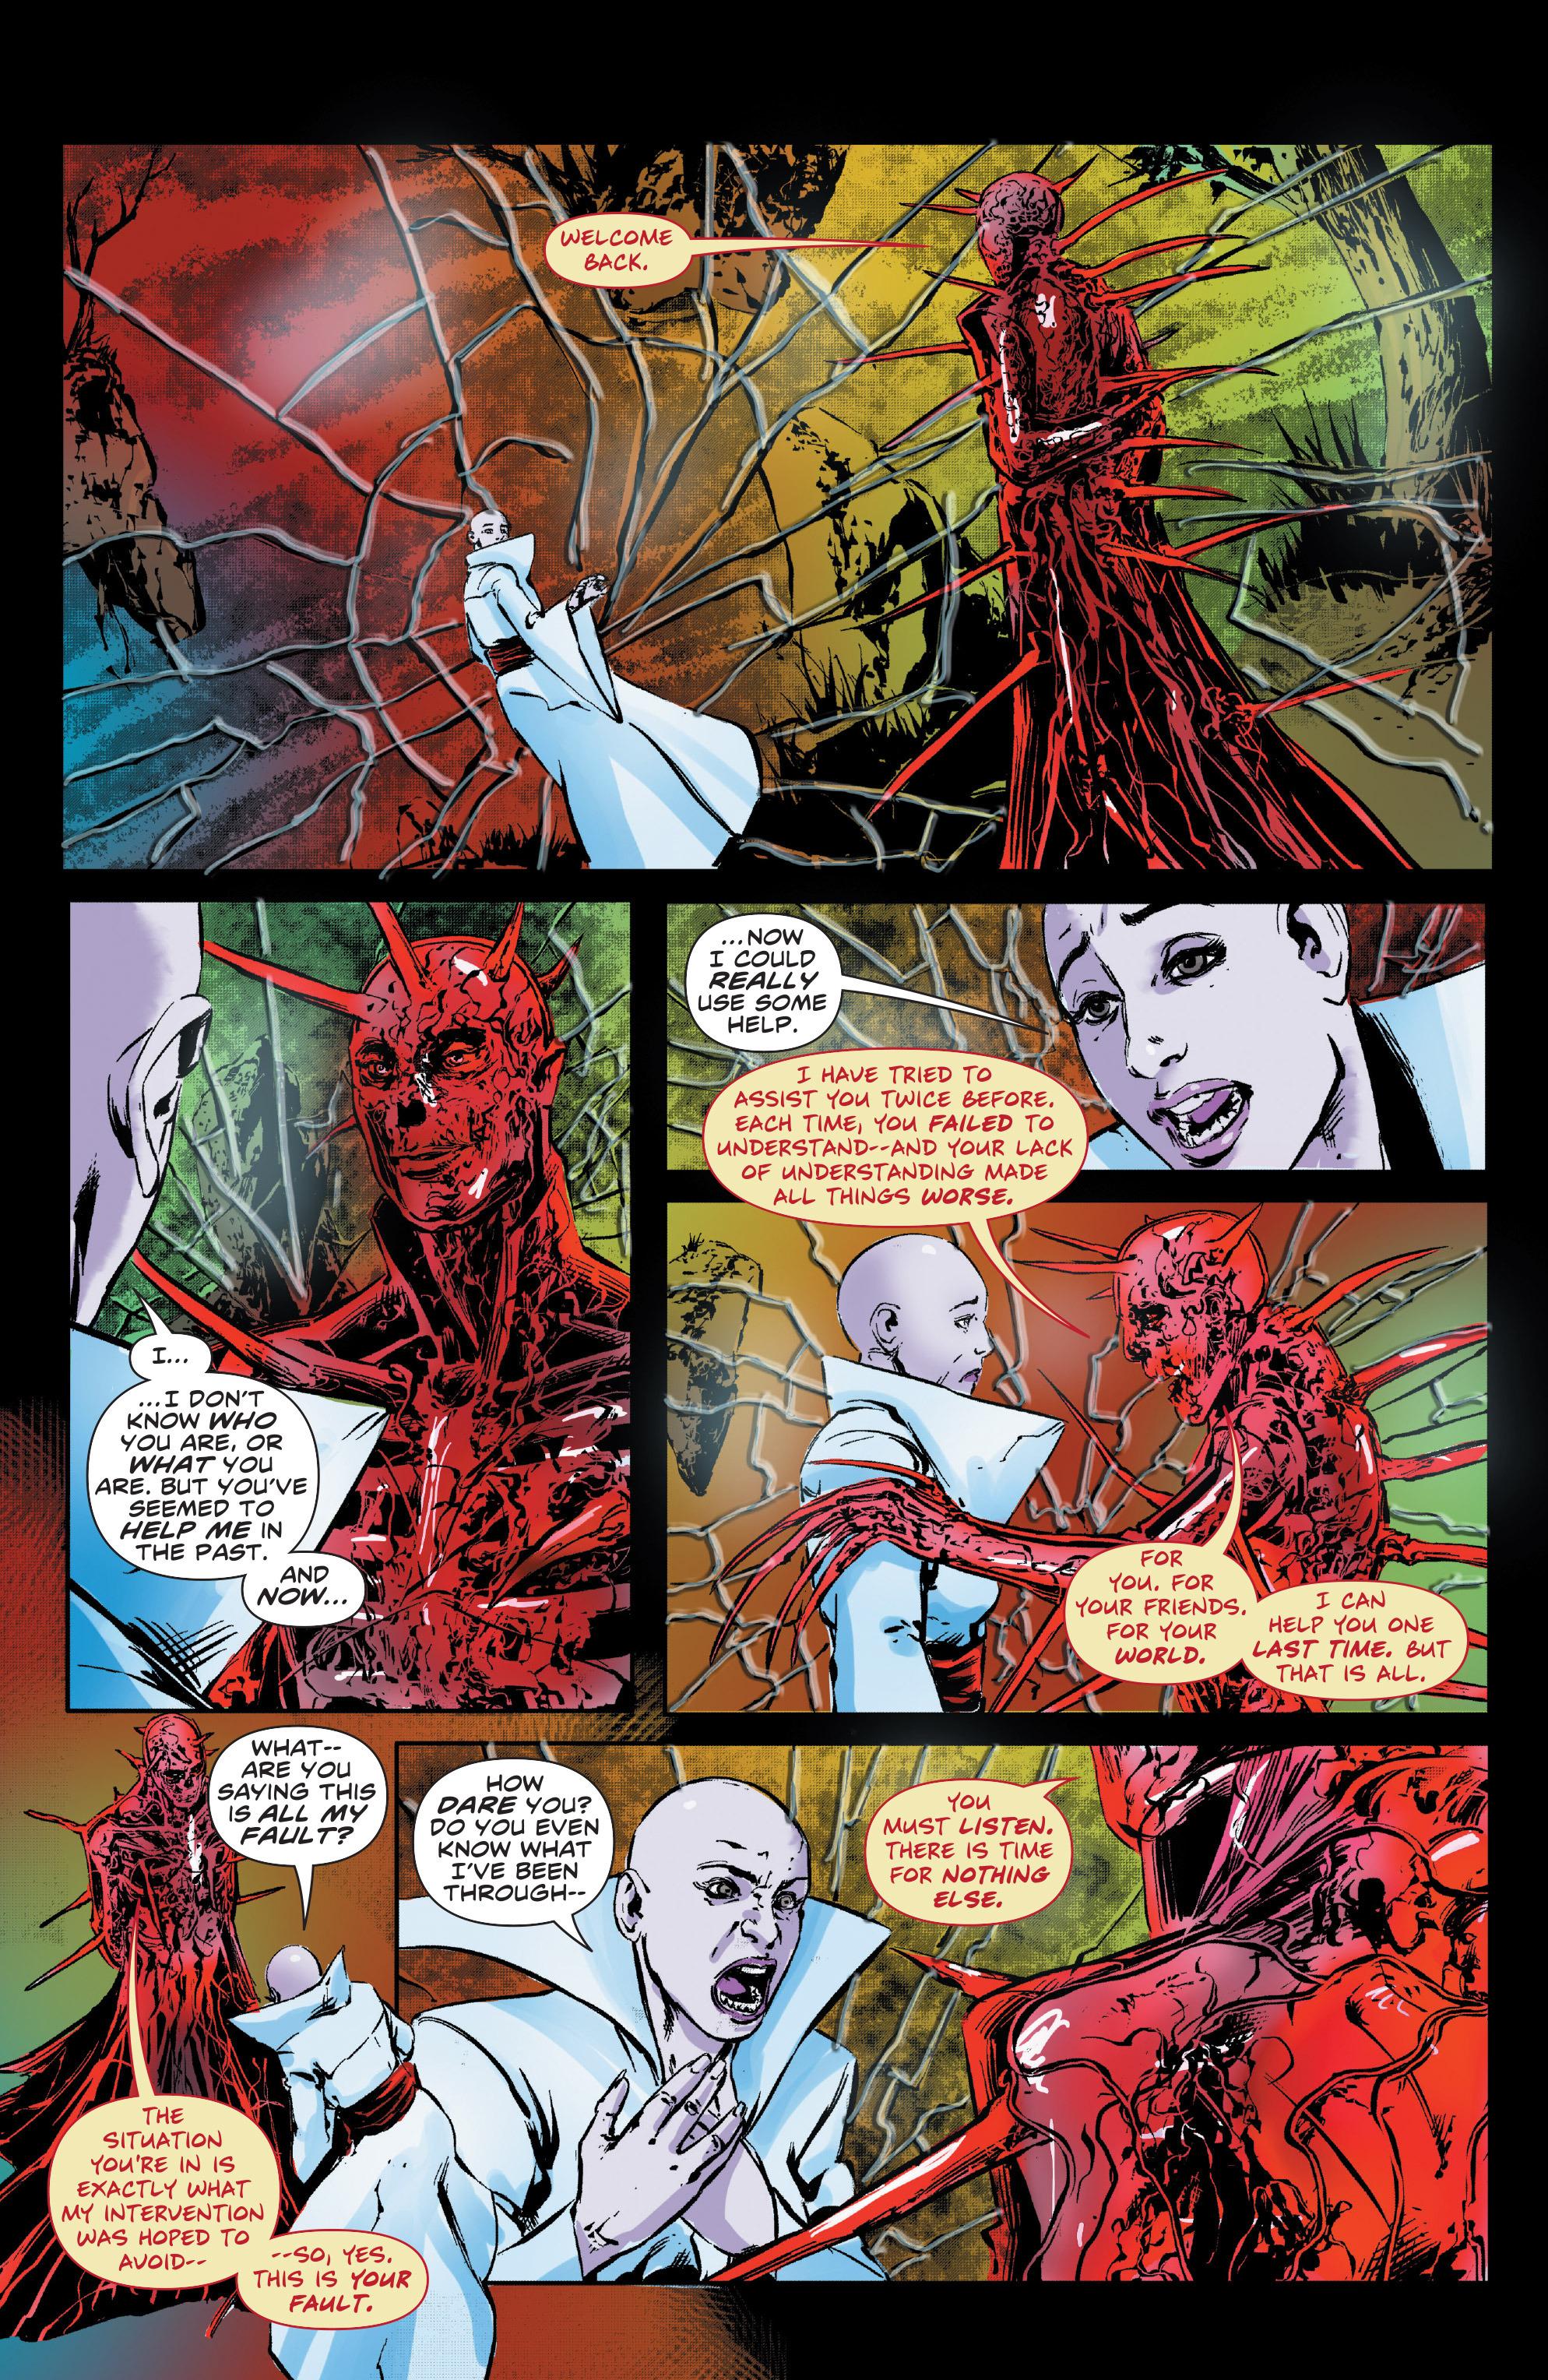 Read online Clive Barker's Hellraiser: The Dark Watch comic -  Issue # TPB 3 - 101